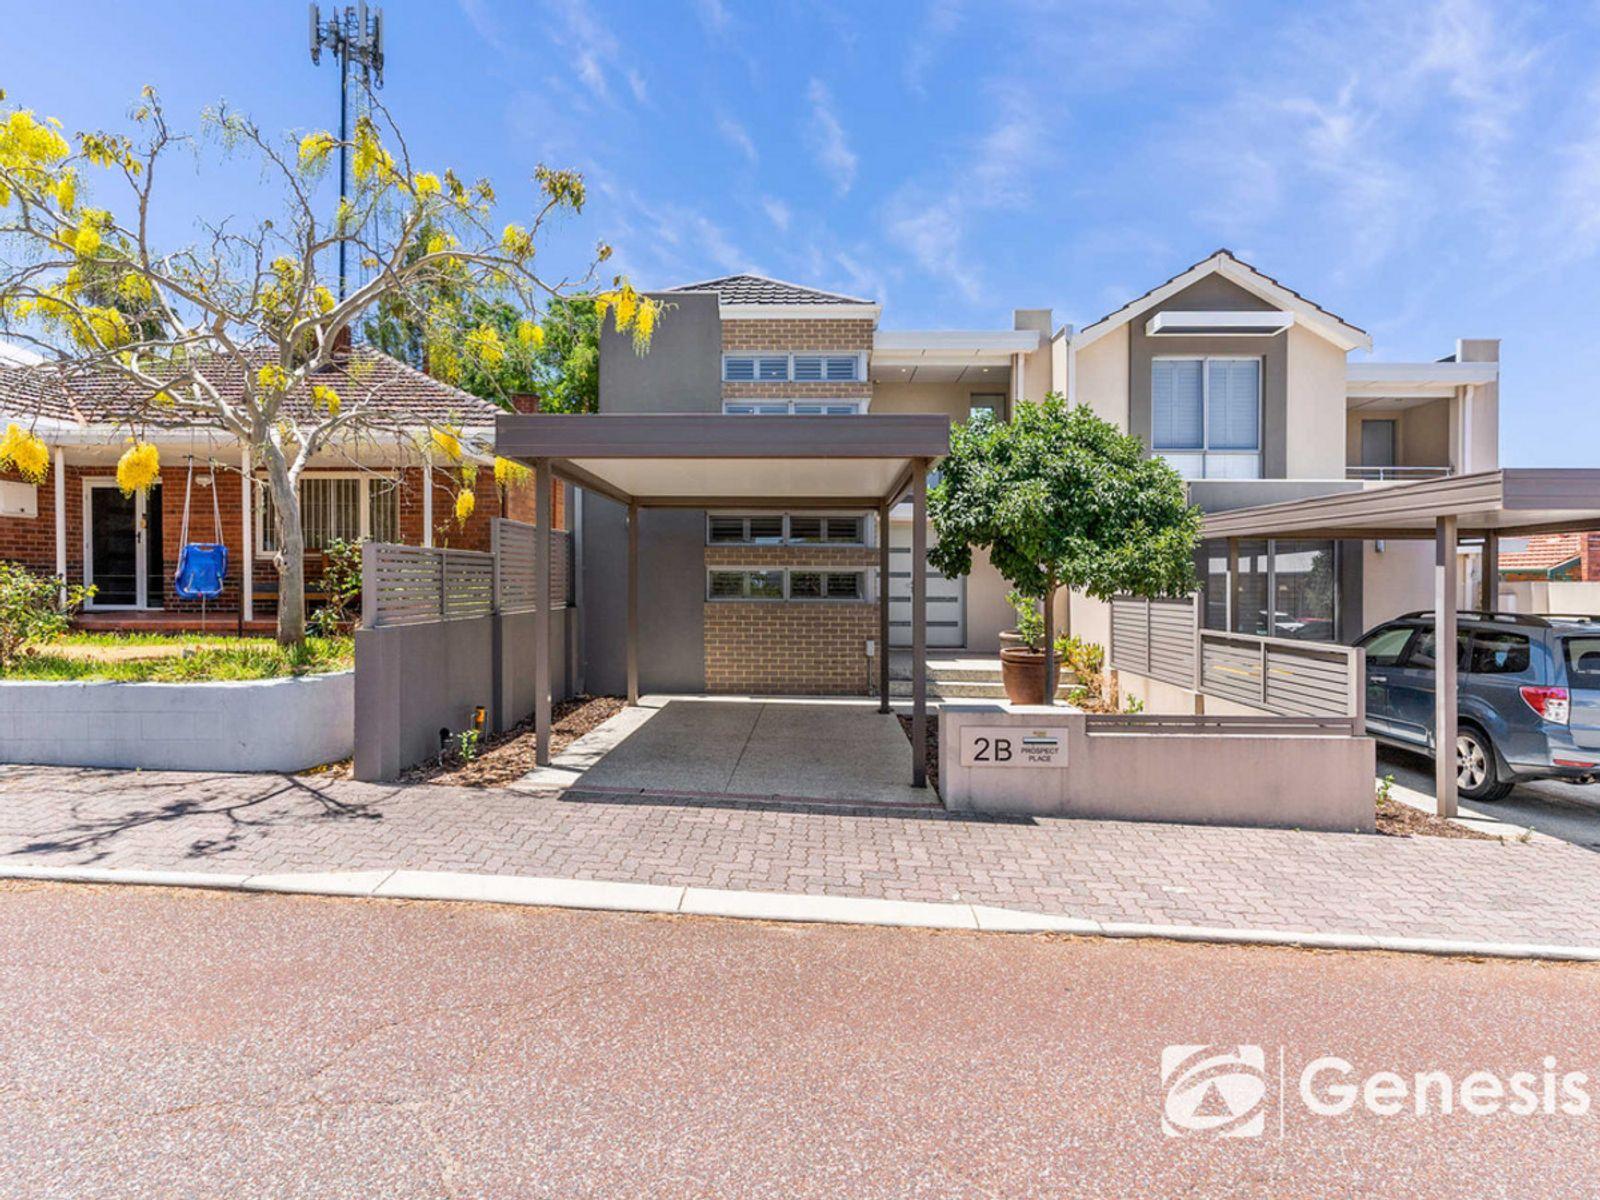 2B Prospect Place, West Perth, WA 6005